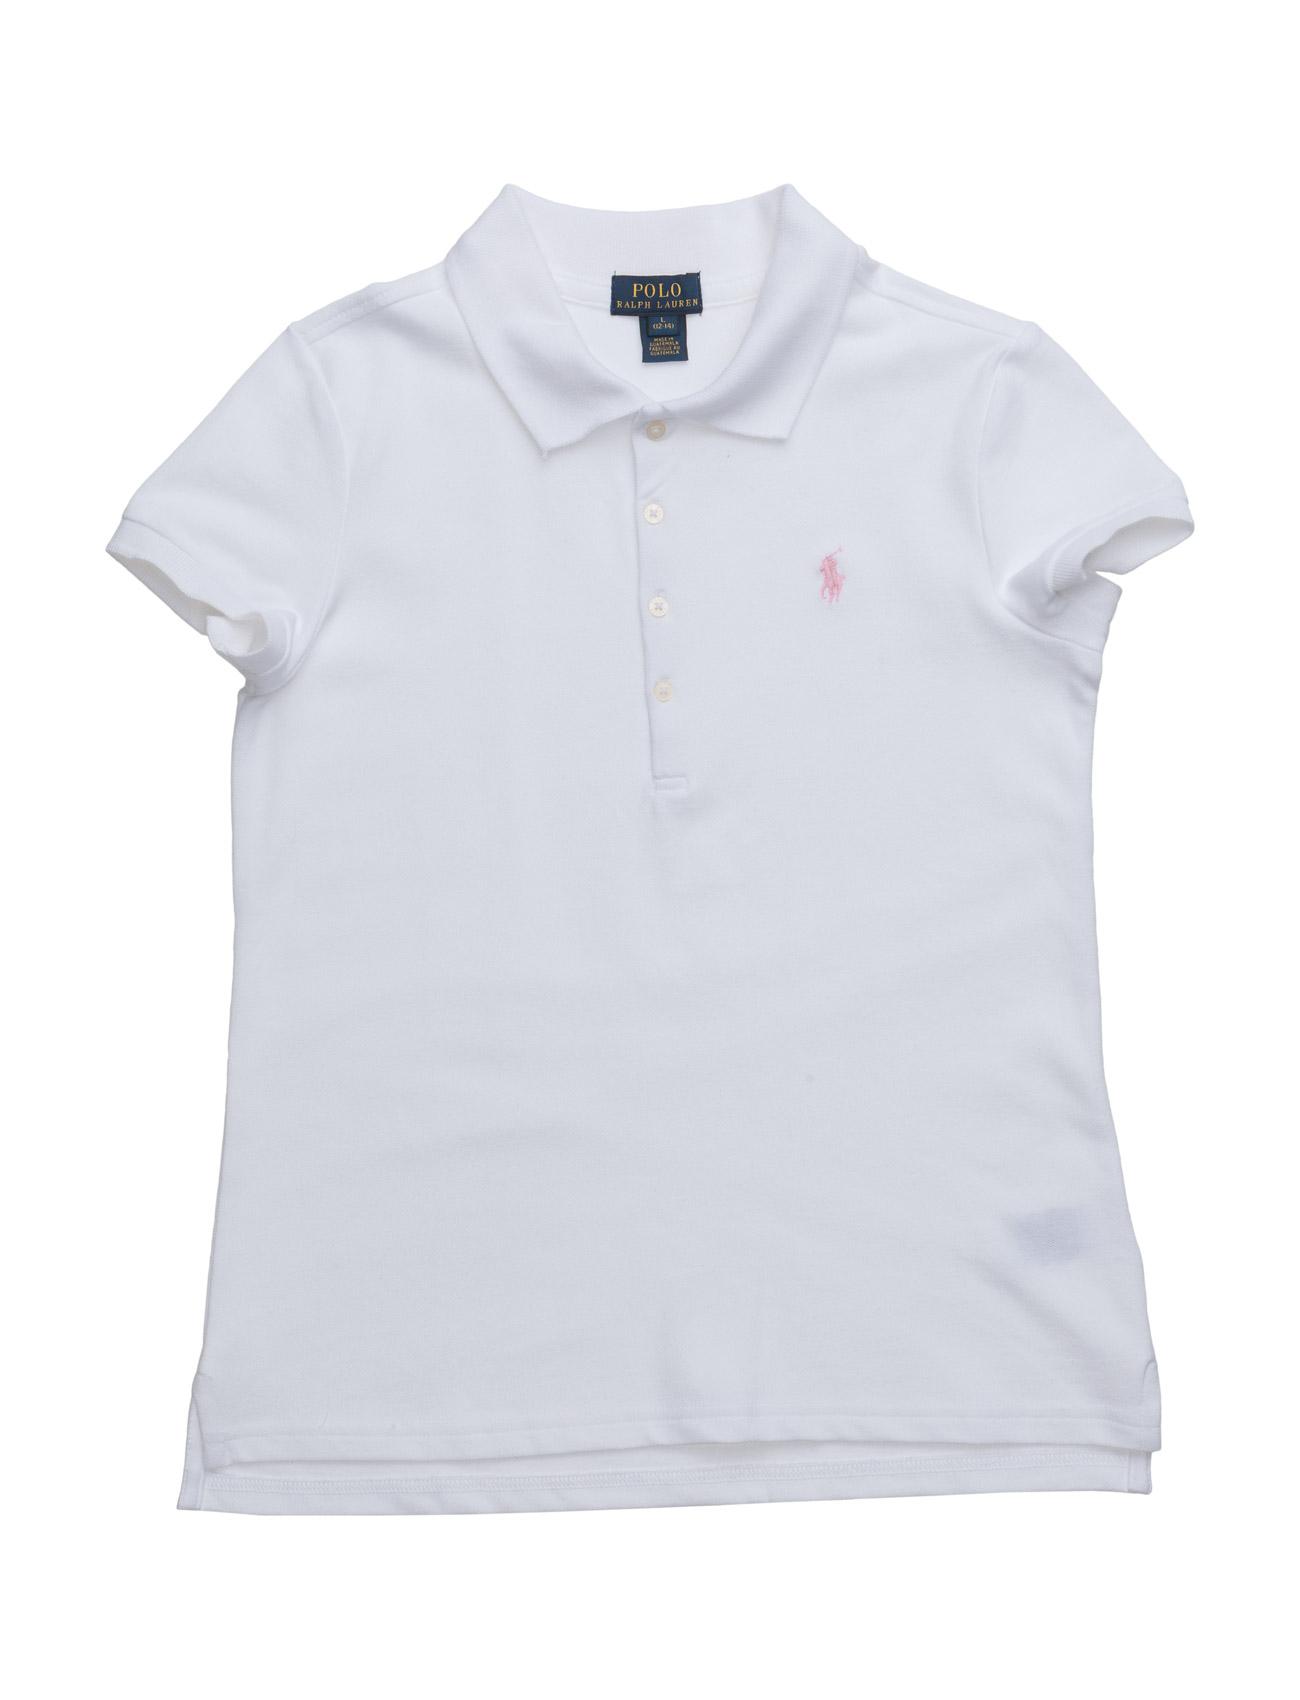 60faff77e91a3 Short Sleeve Mesh Polo (White) (59 €) - Ralph Lauren Kids -